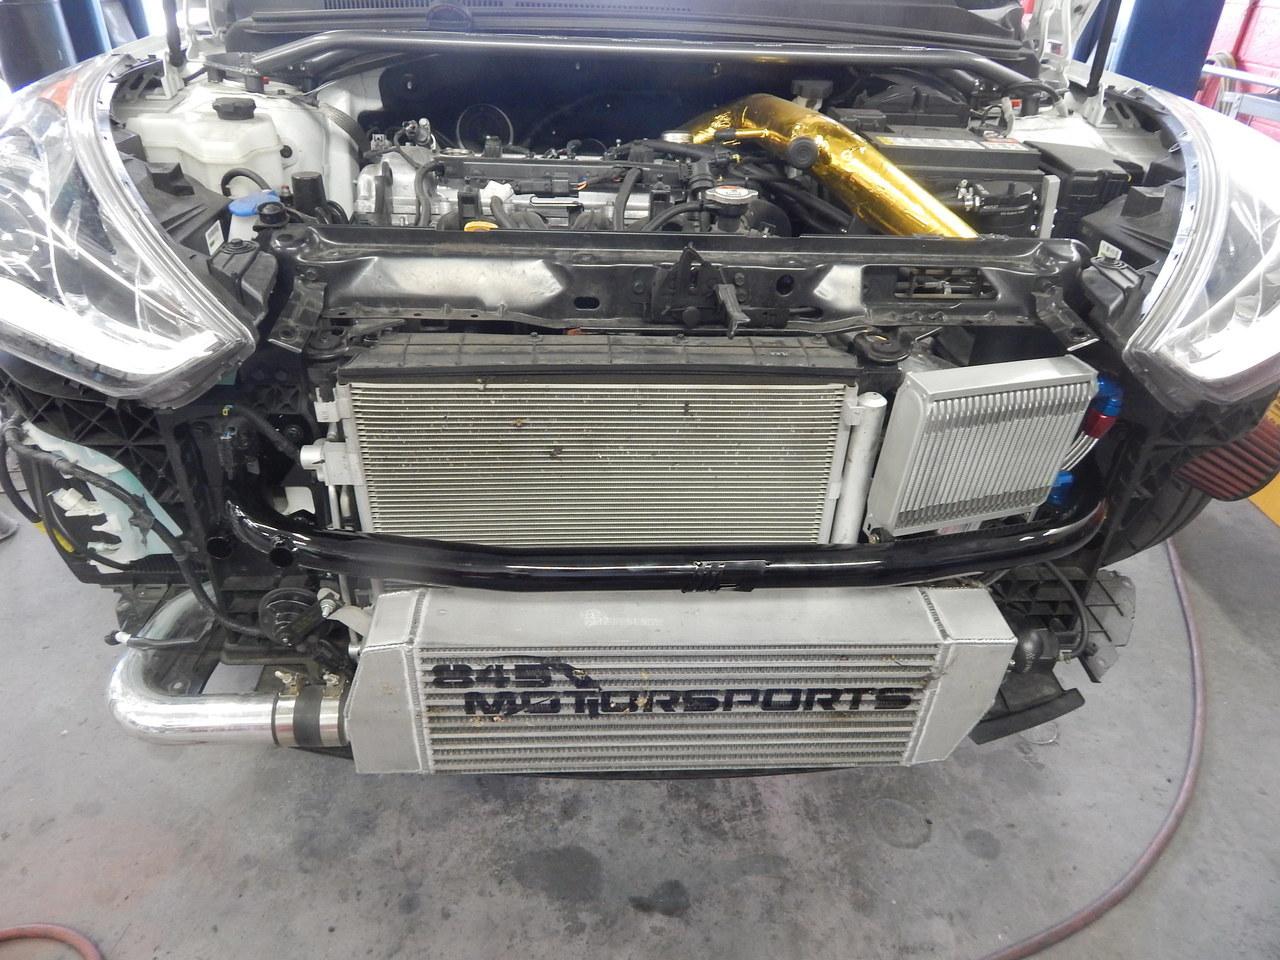 Piercemotorsports Veloster Turbo Oil Cooler Kit 845